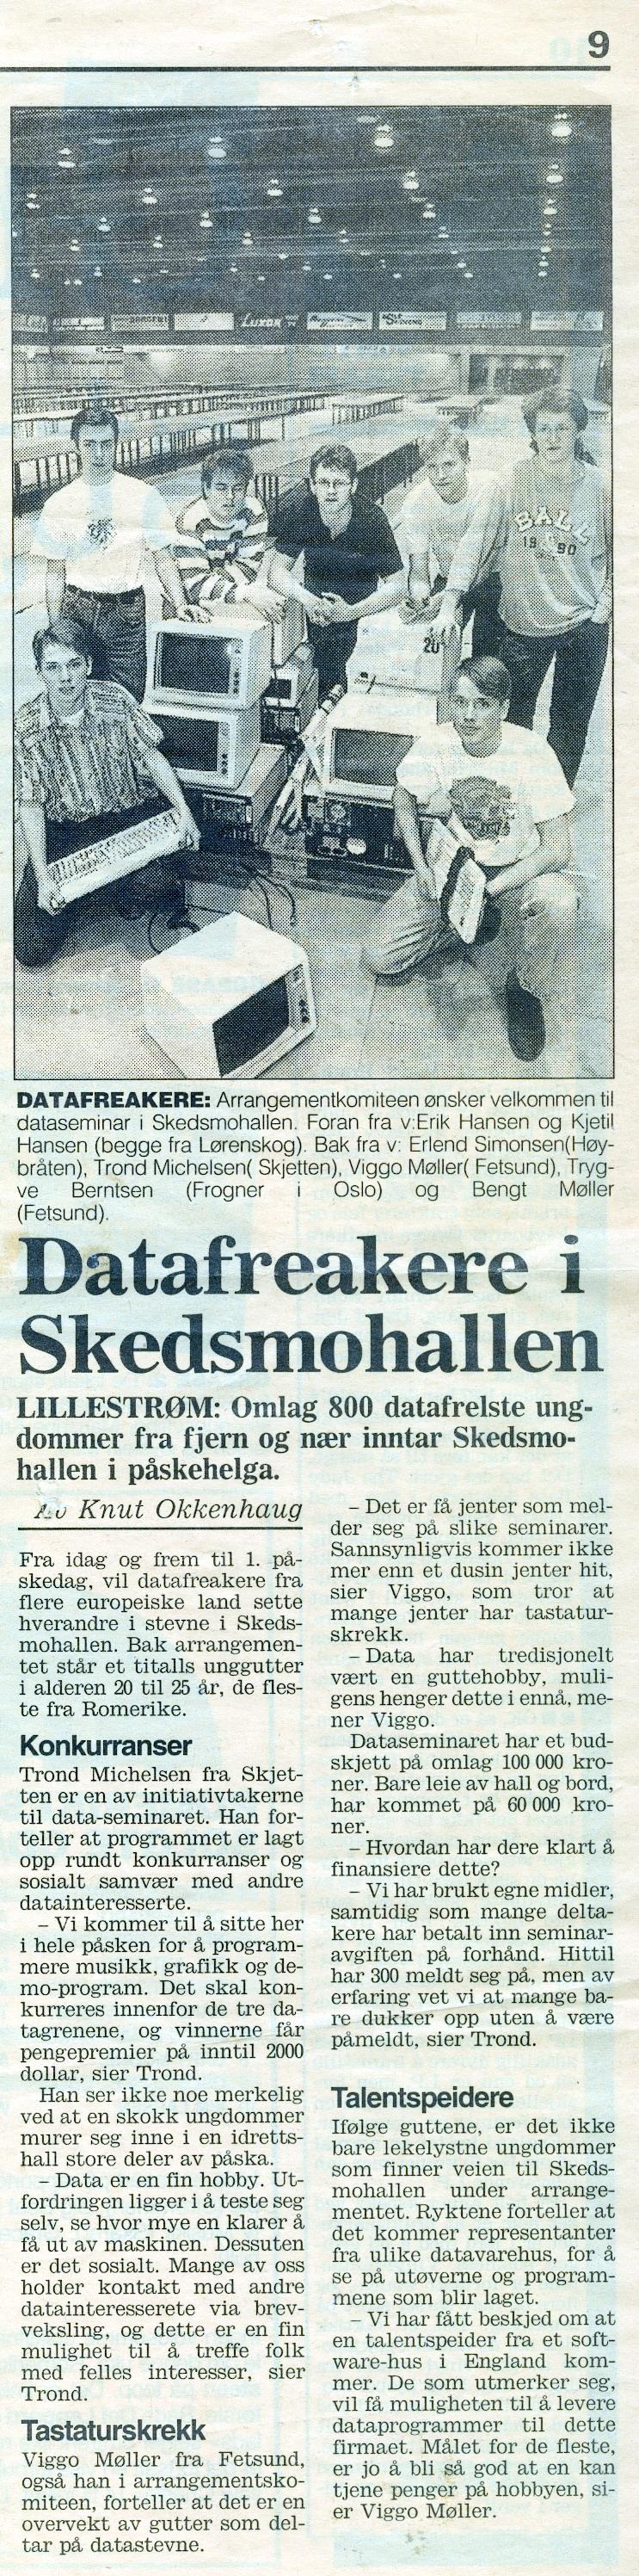 _Datafreakere_ i Skedsmohallen